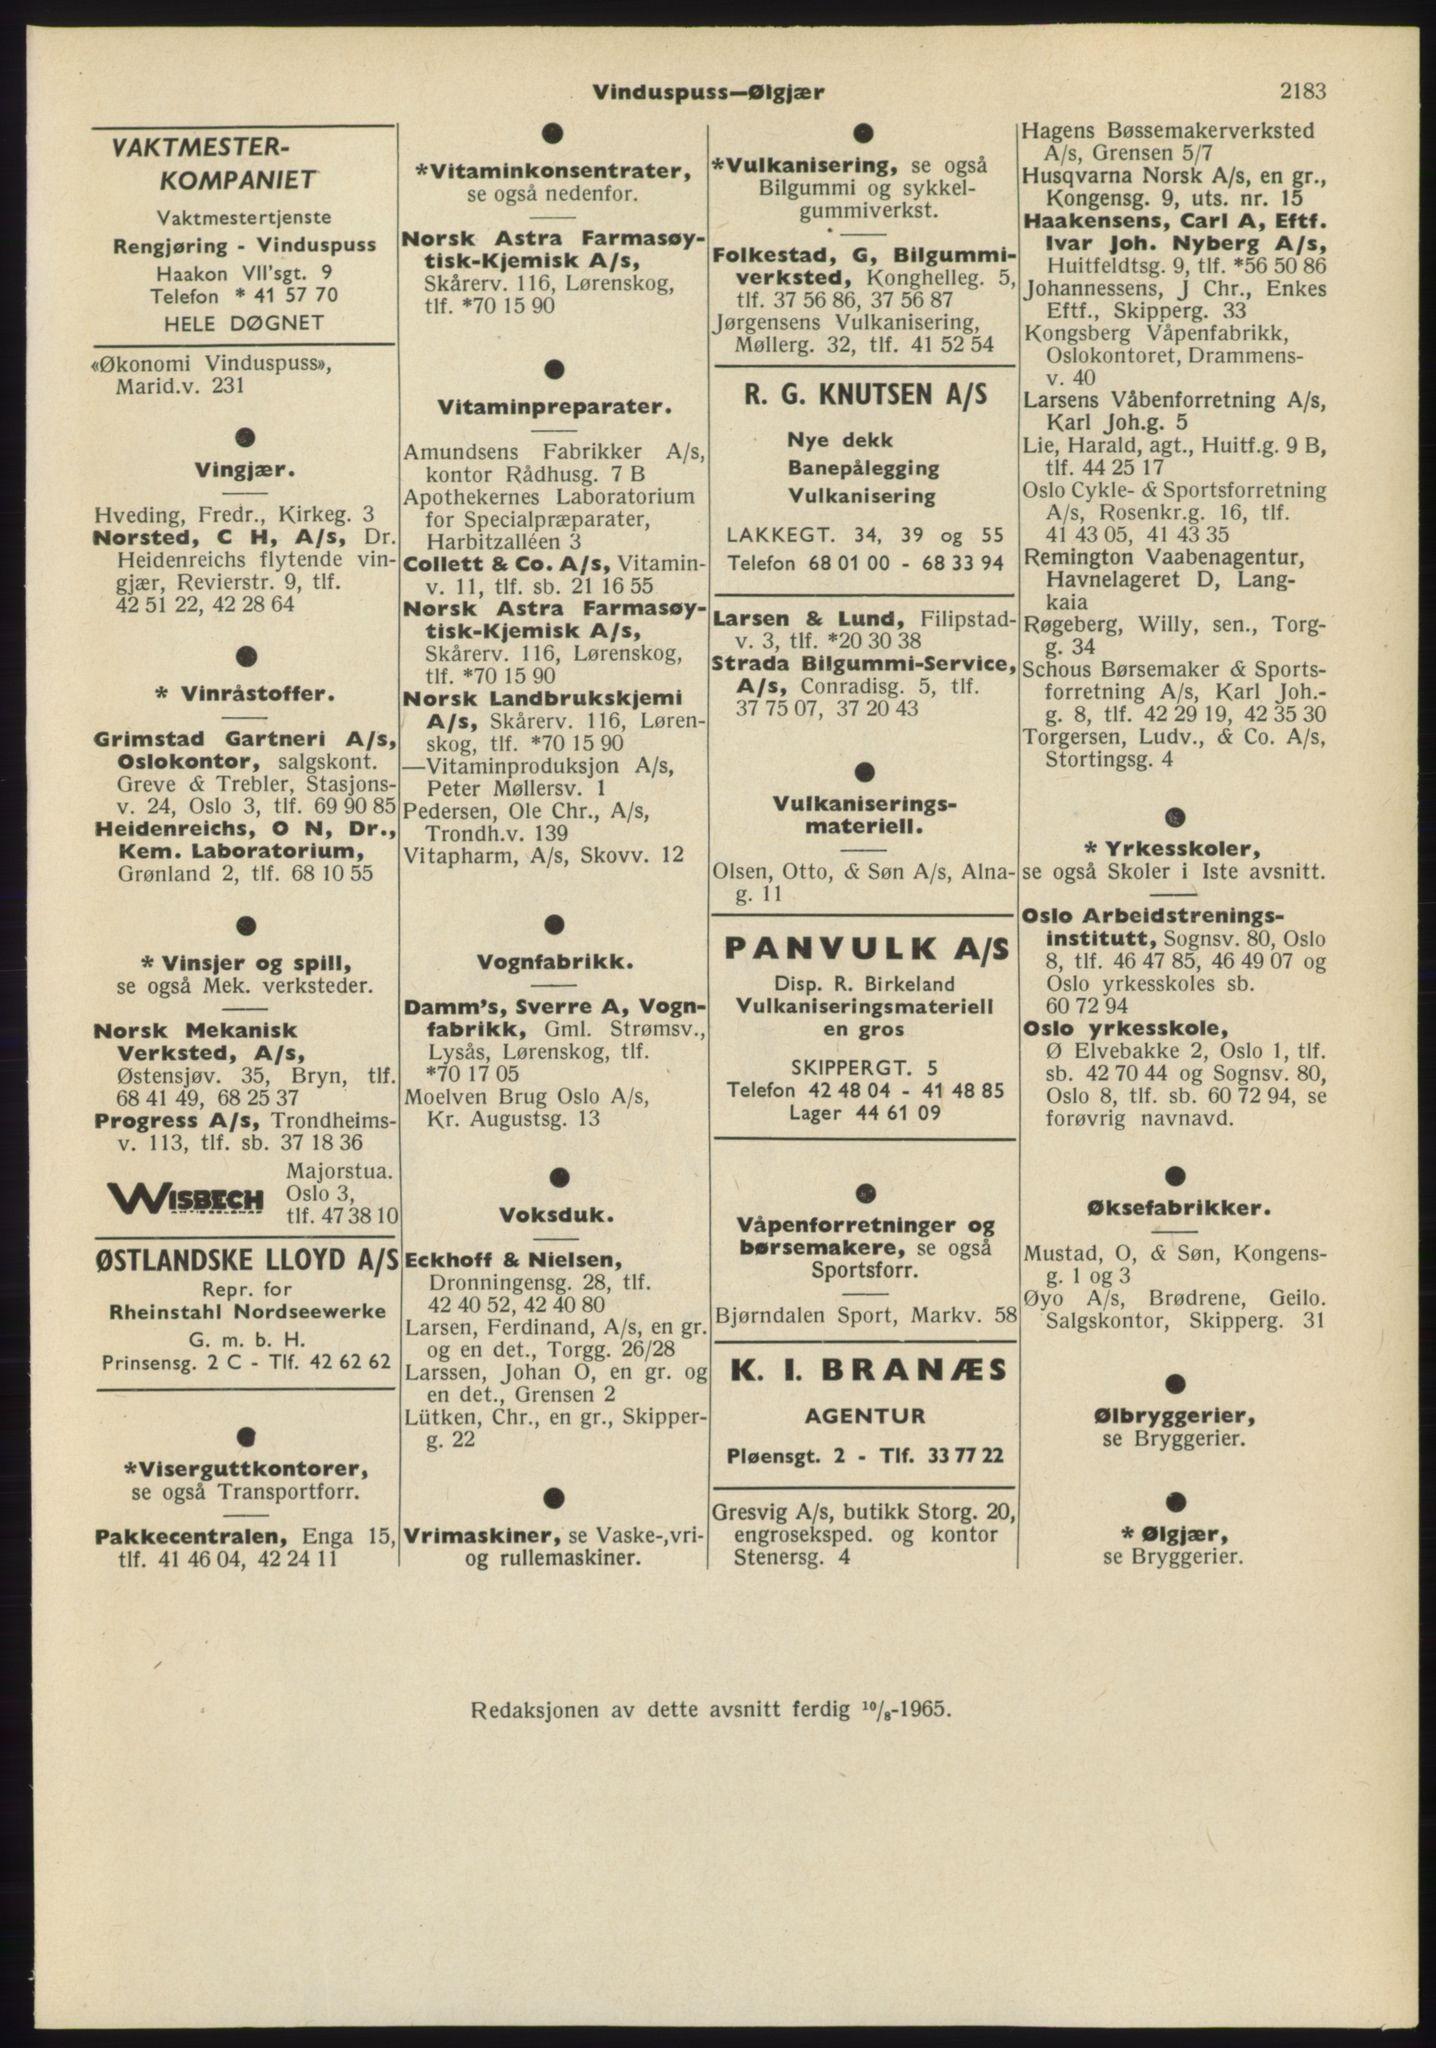 PUBL, Kristiania/Oslo adressebok, 1965-1966, s. 2183